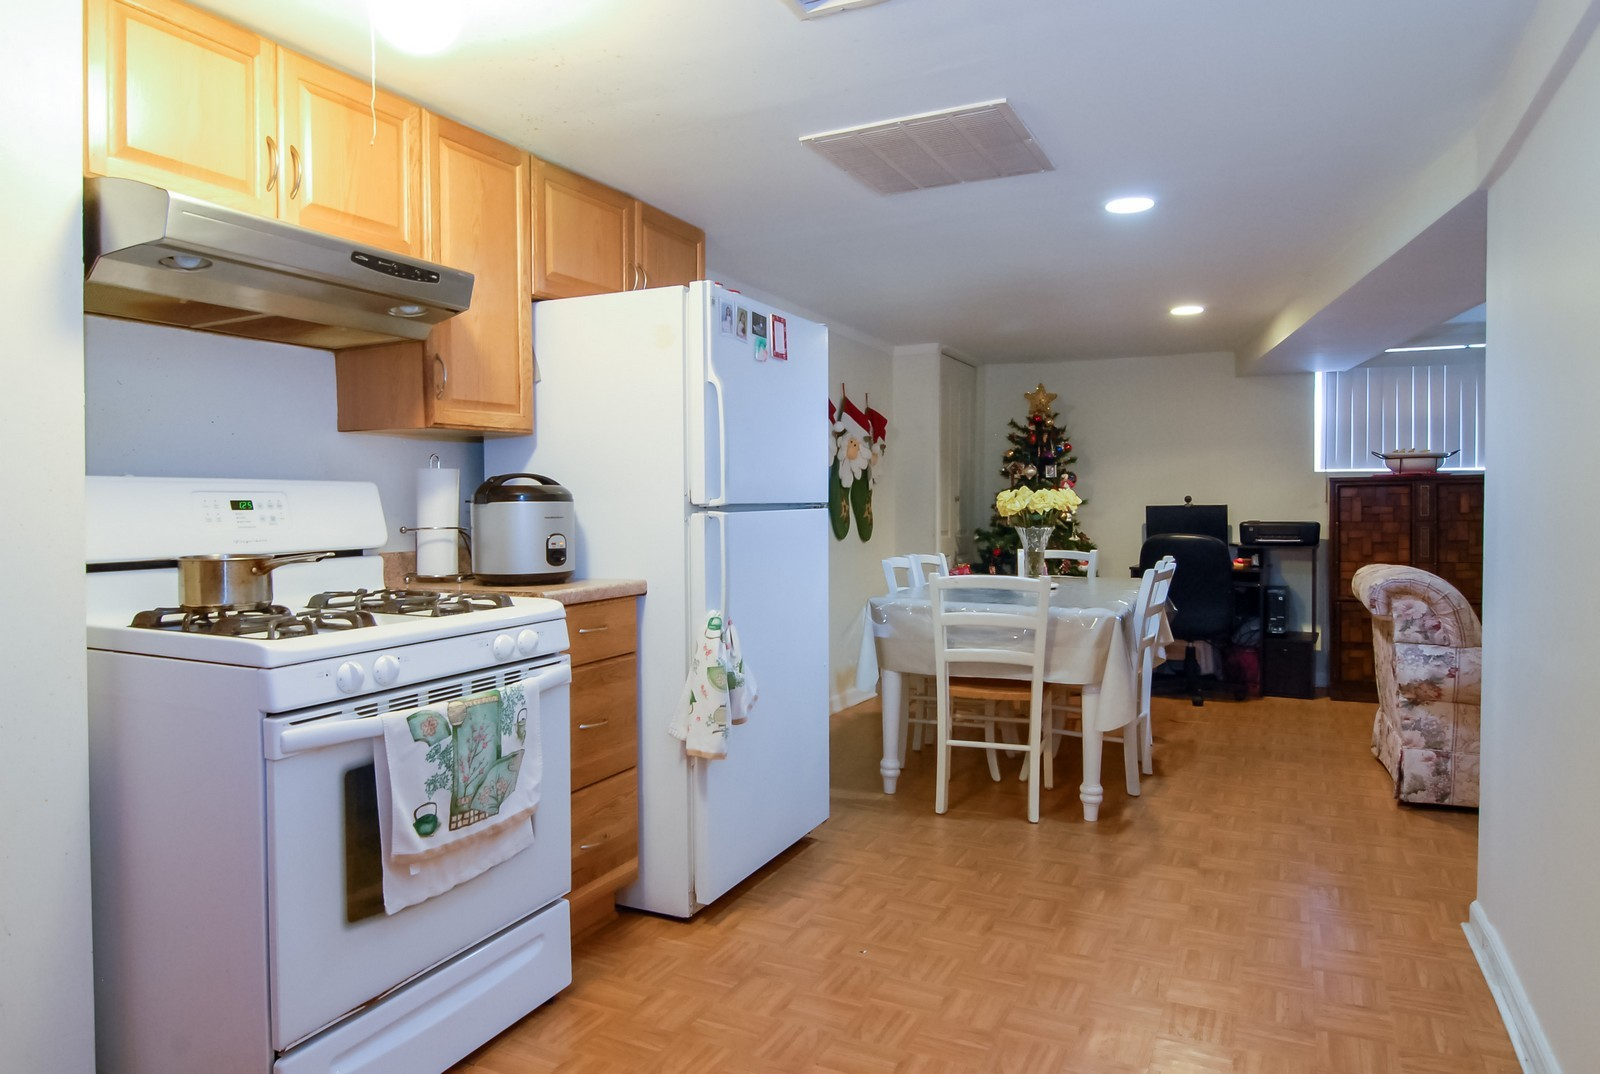 Real Estate Photography - 4435 Keokuk, Chicago, IL, 60630 - Kitchen